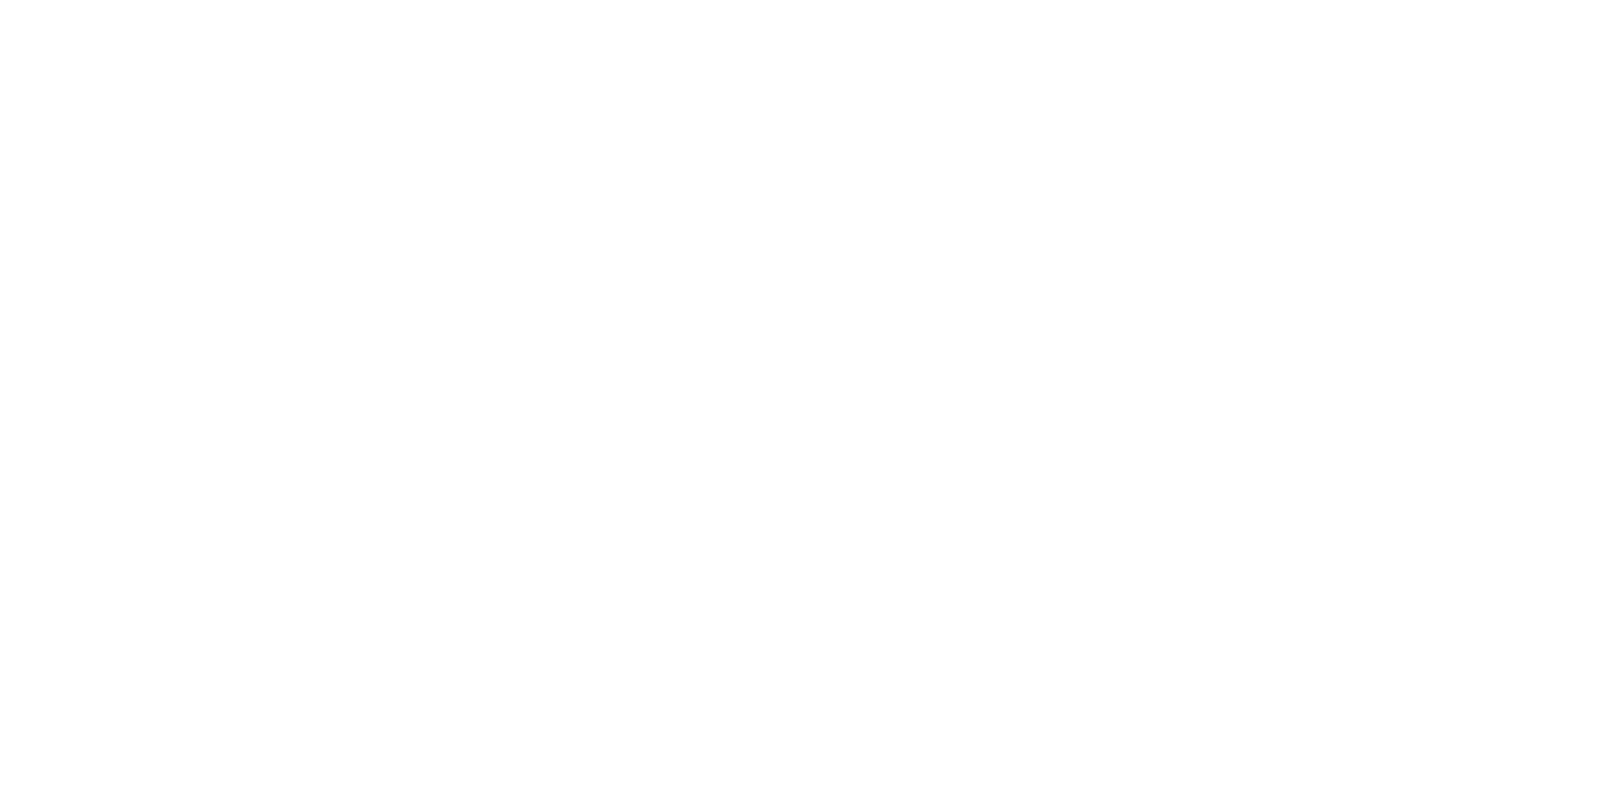 gogox-logo-white